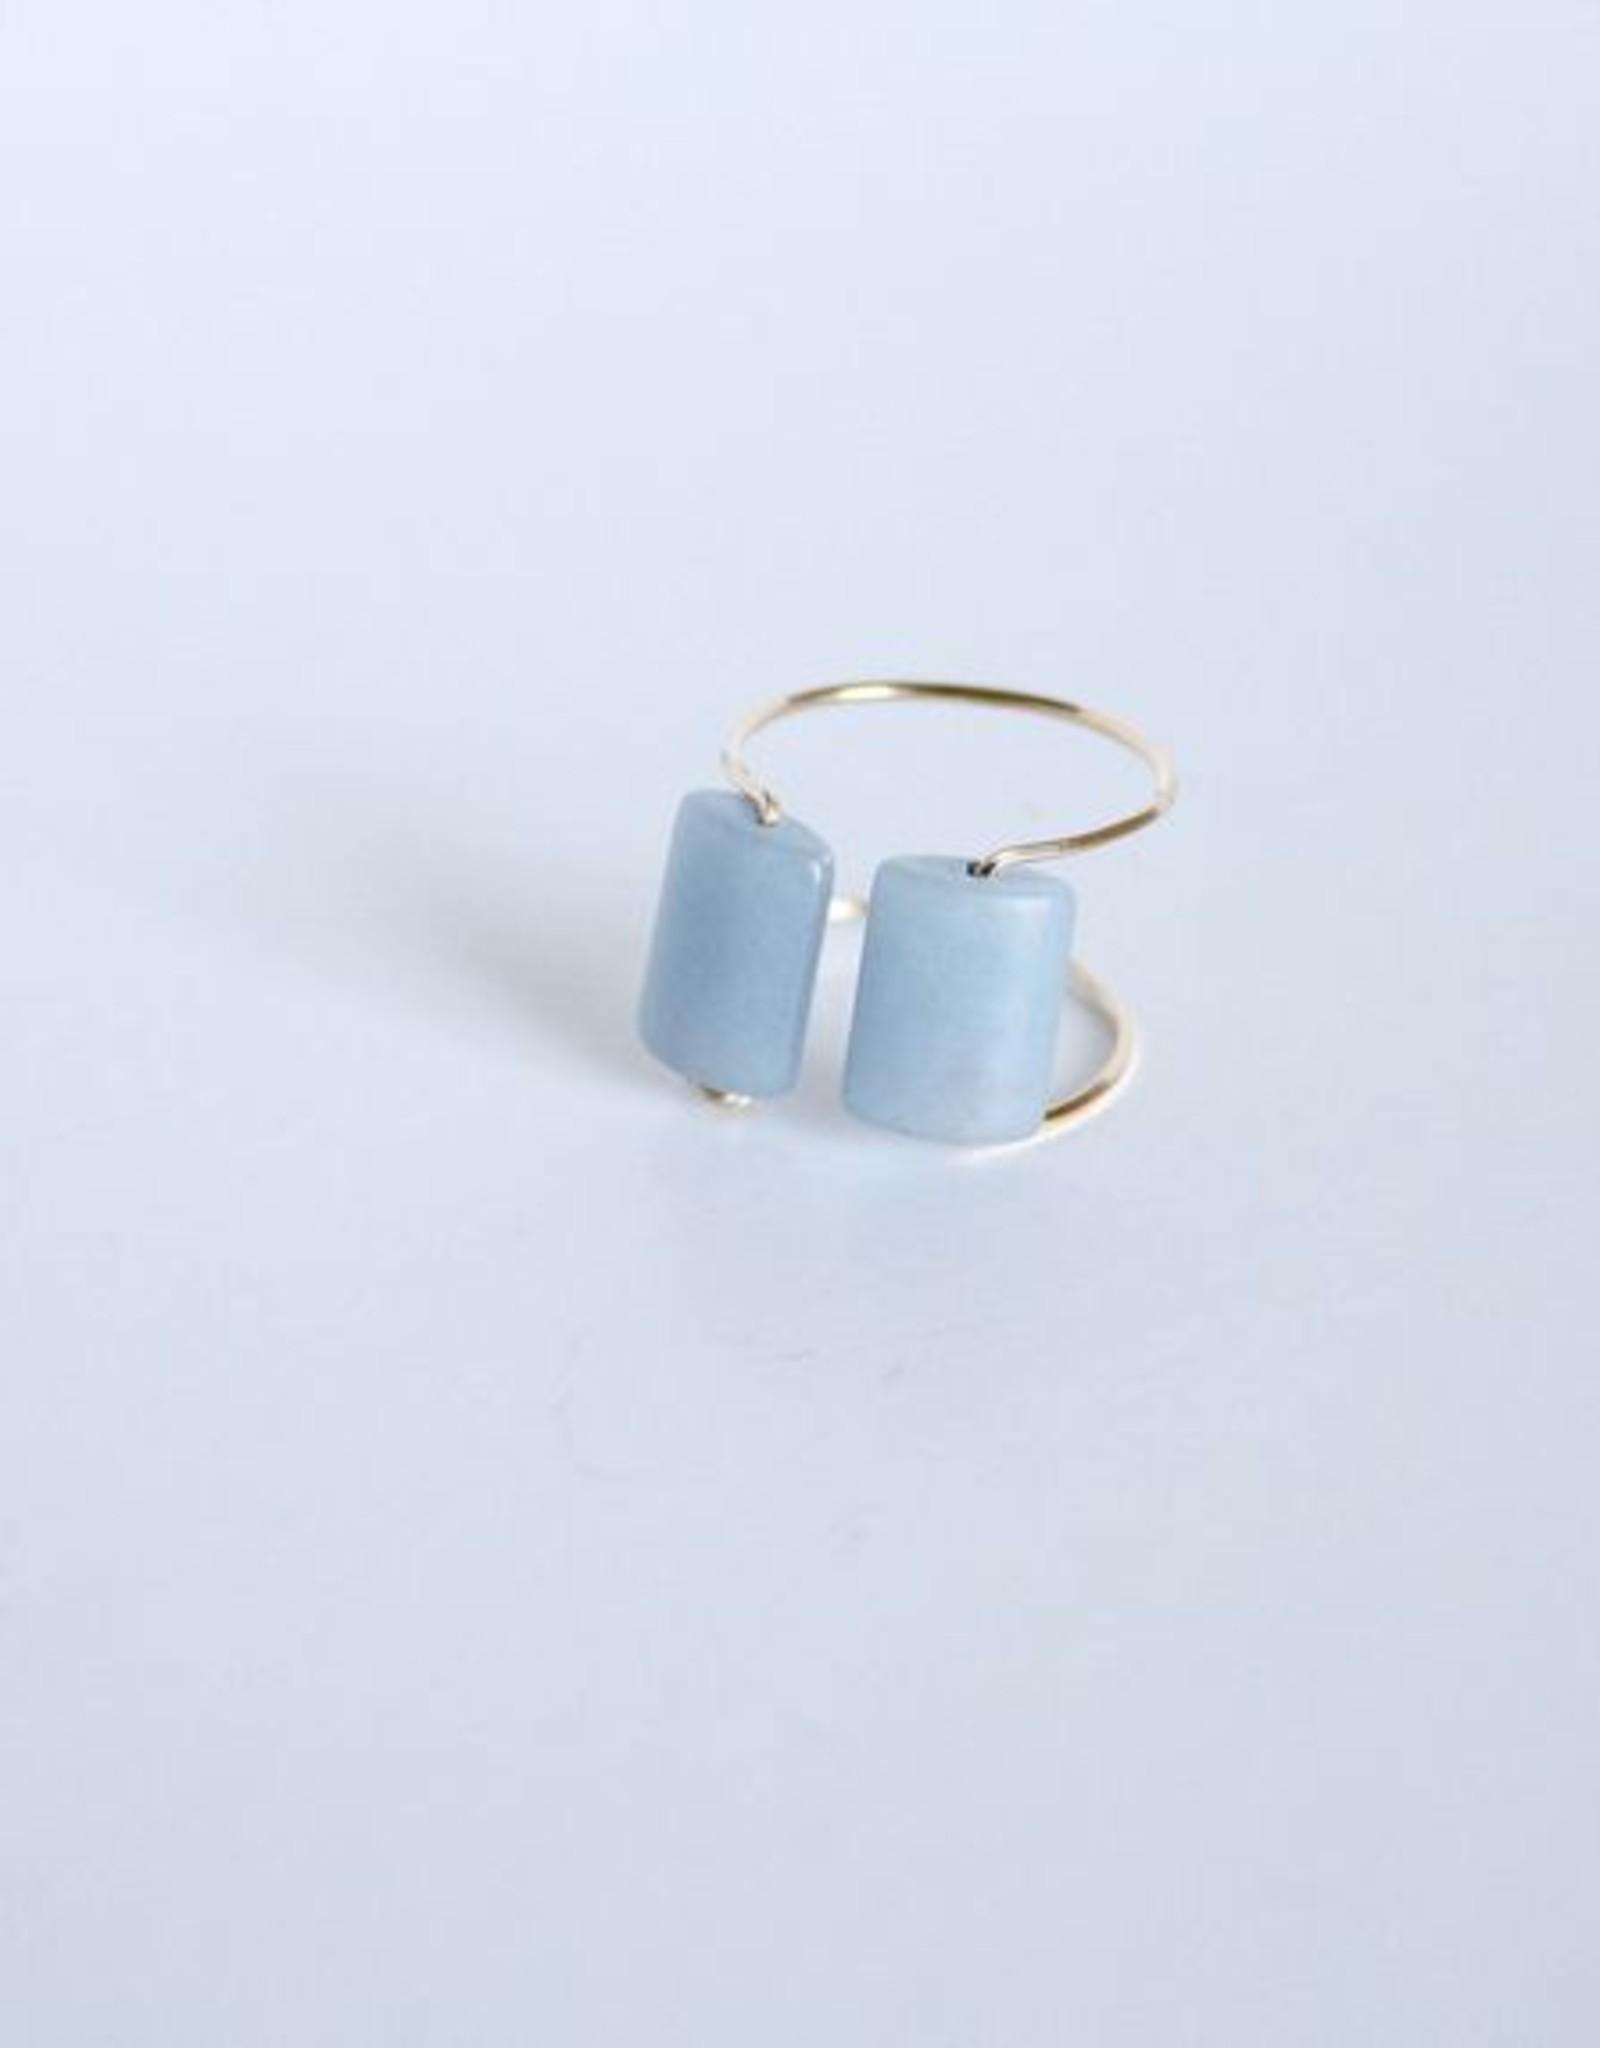 Hali Open Ring Cuff